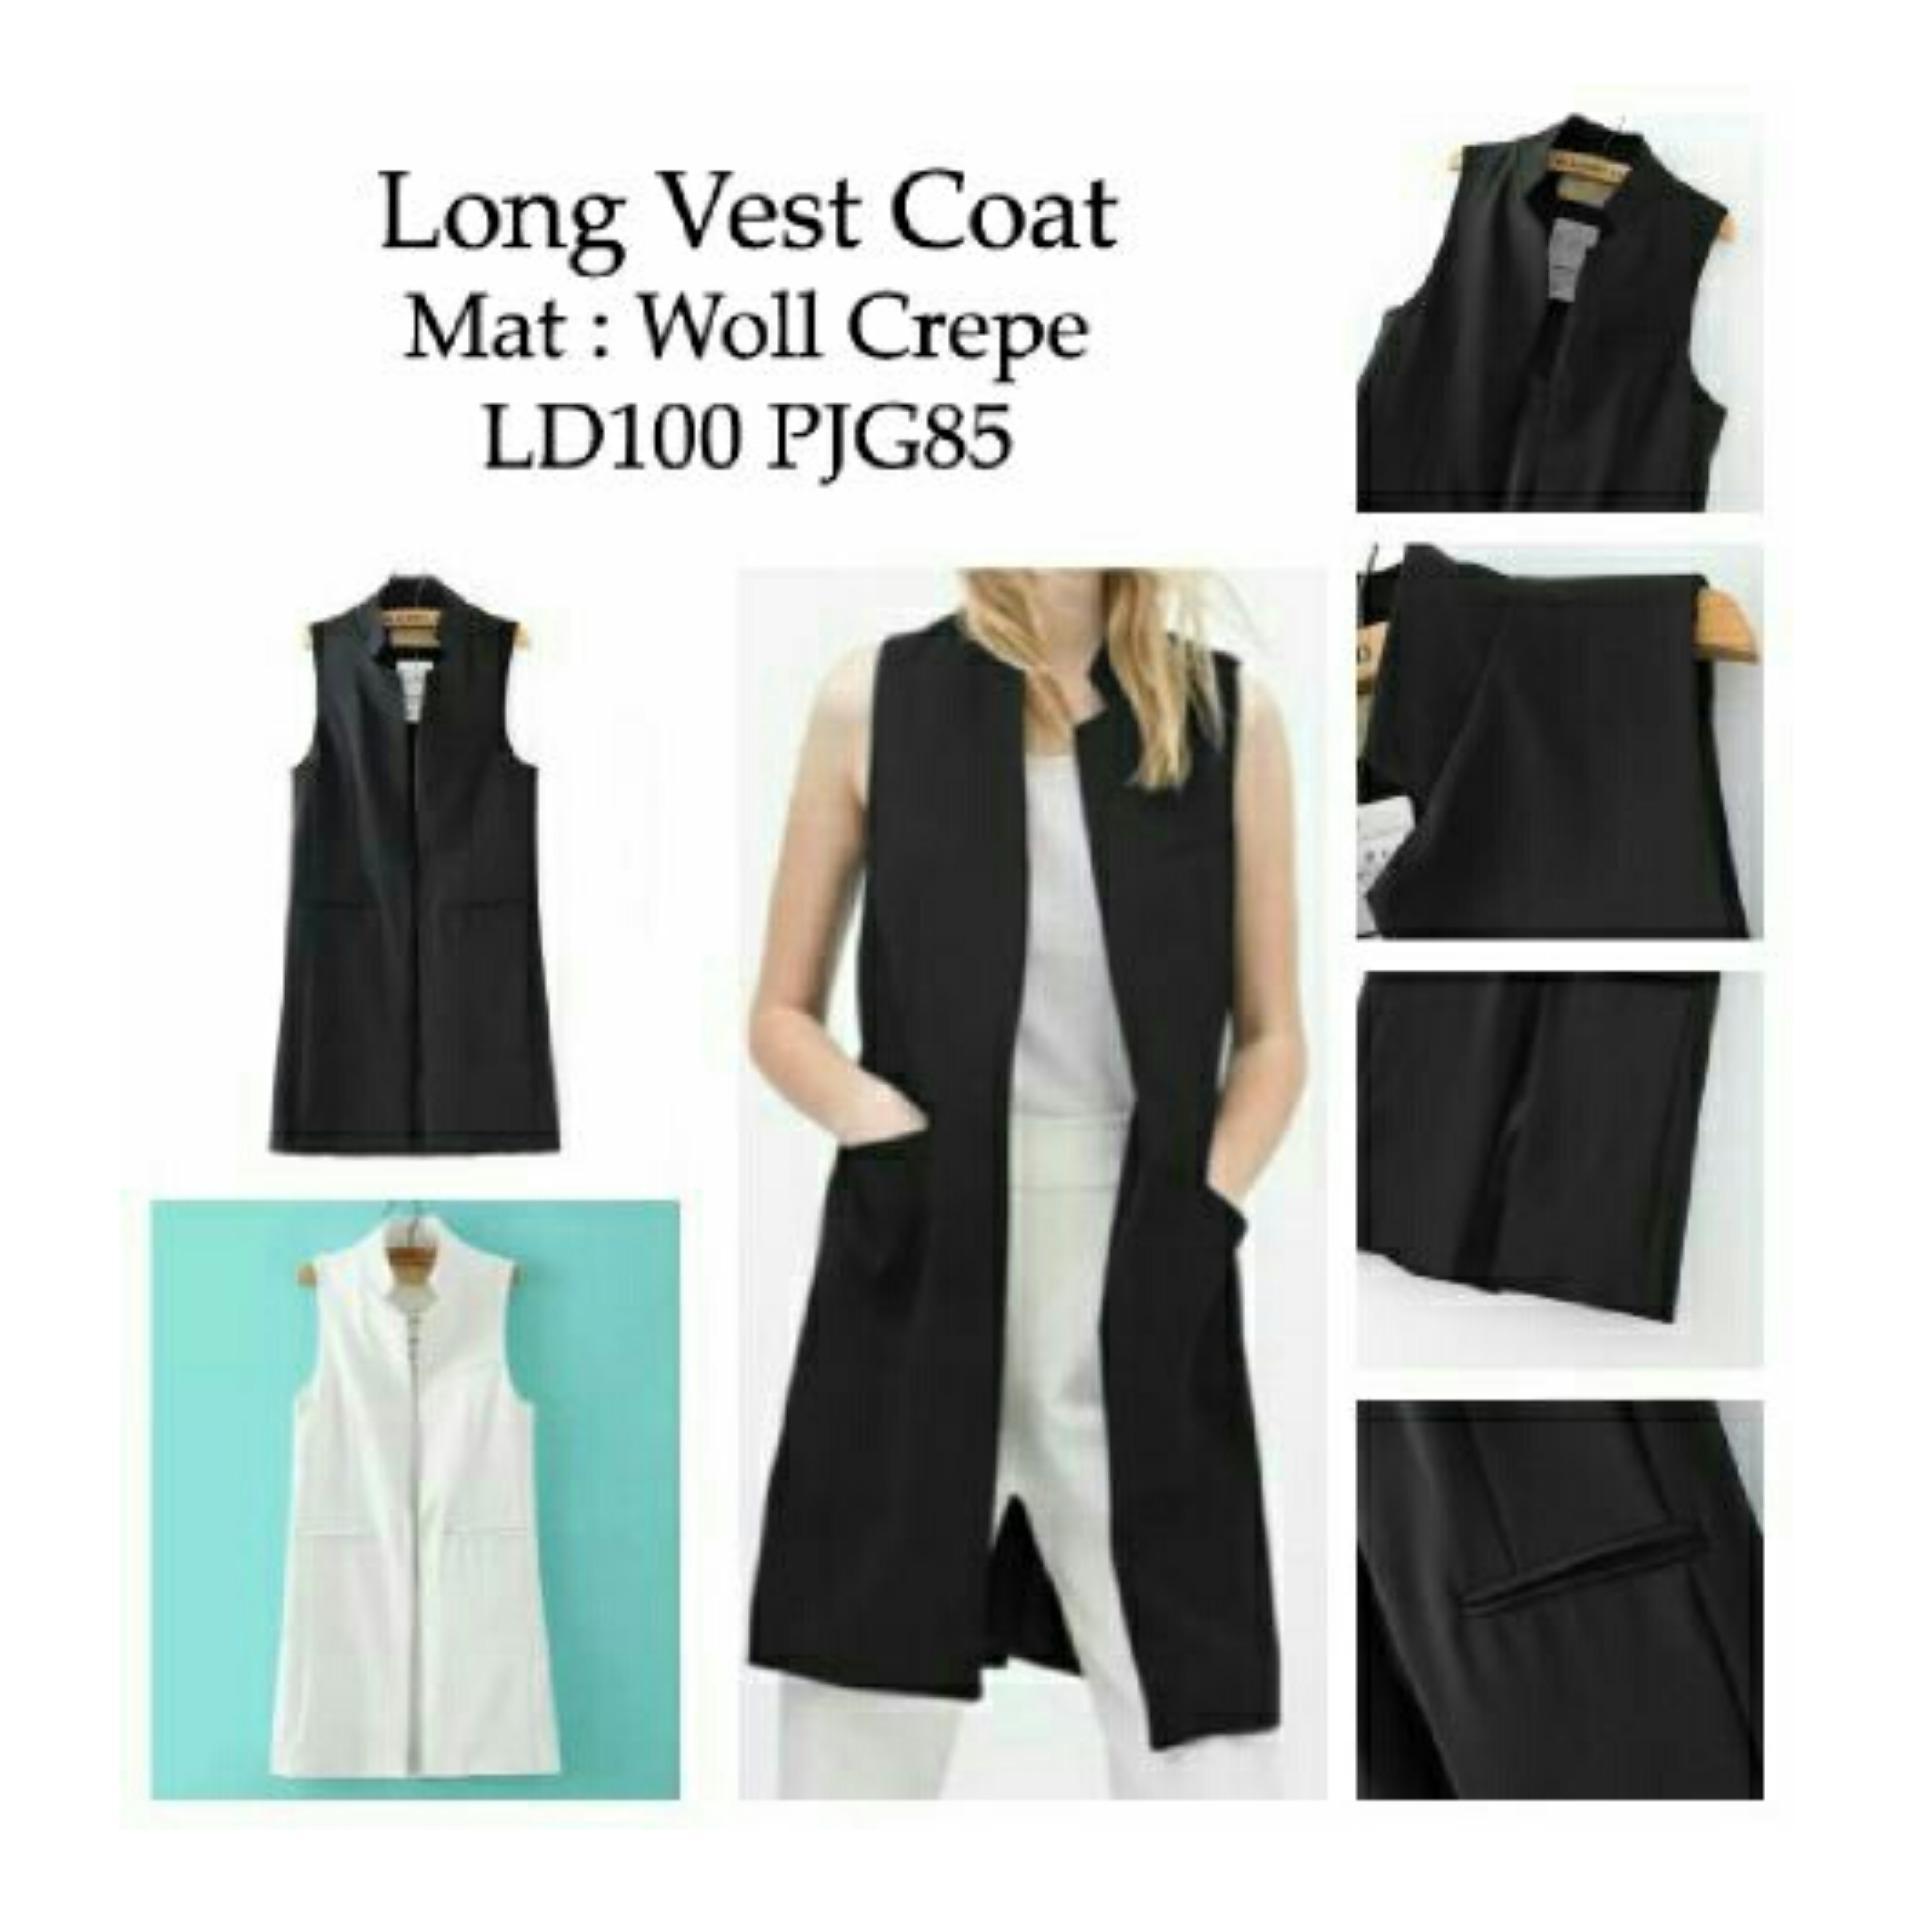 Flash Sale RatuCouple Vest Ignacia / Cardingan / Long Vest Coat / Jaket Rompi Wanita NR - Hitam